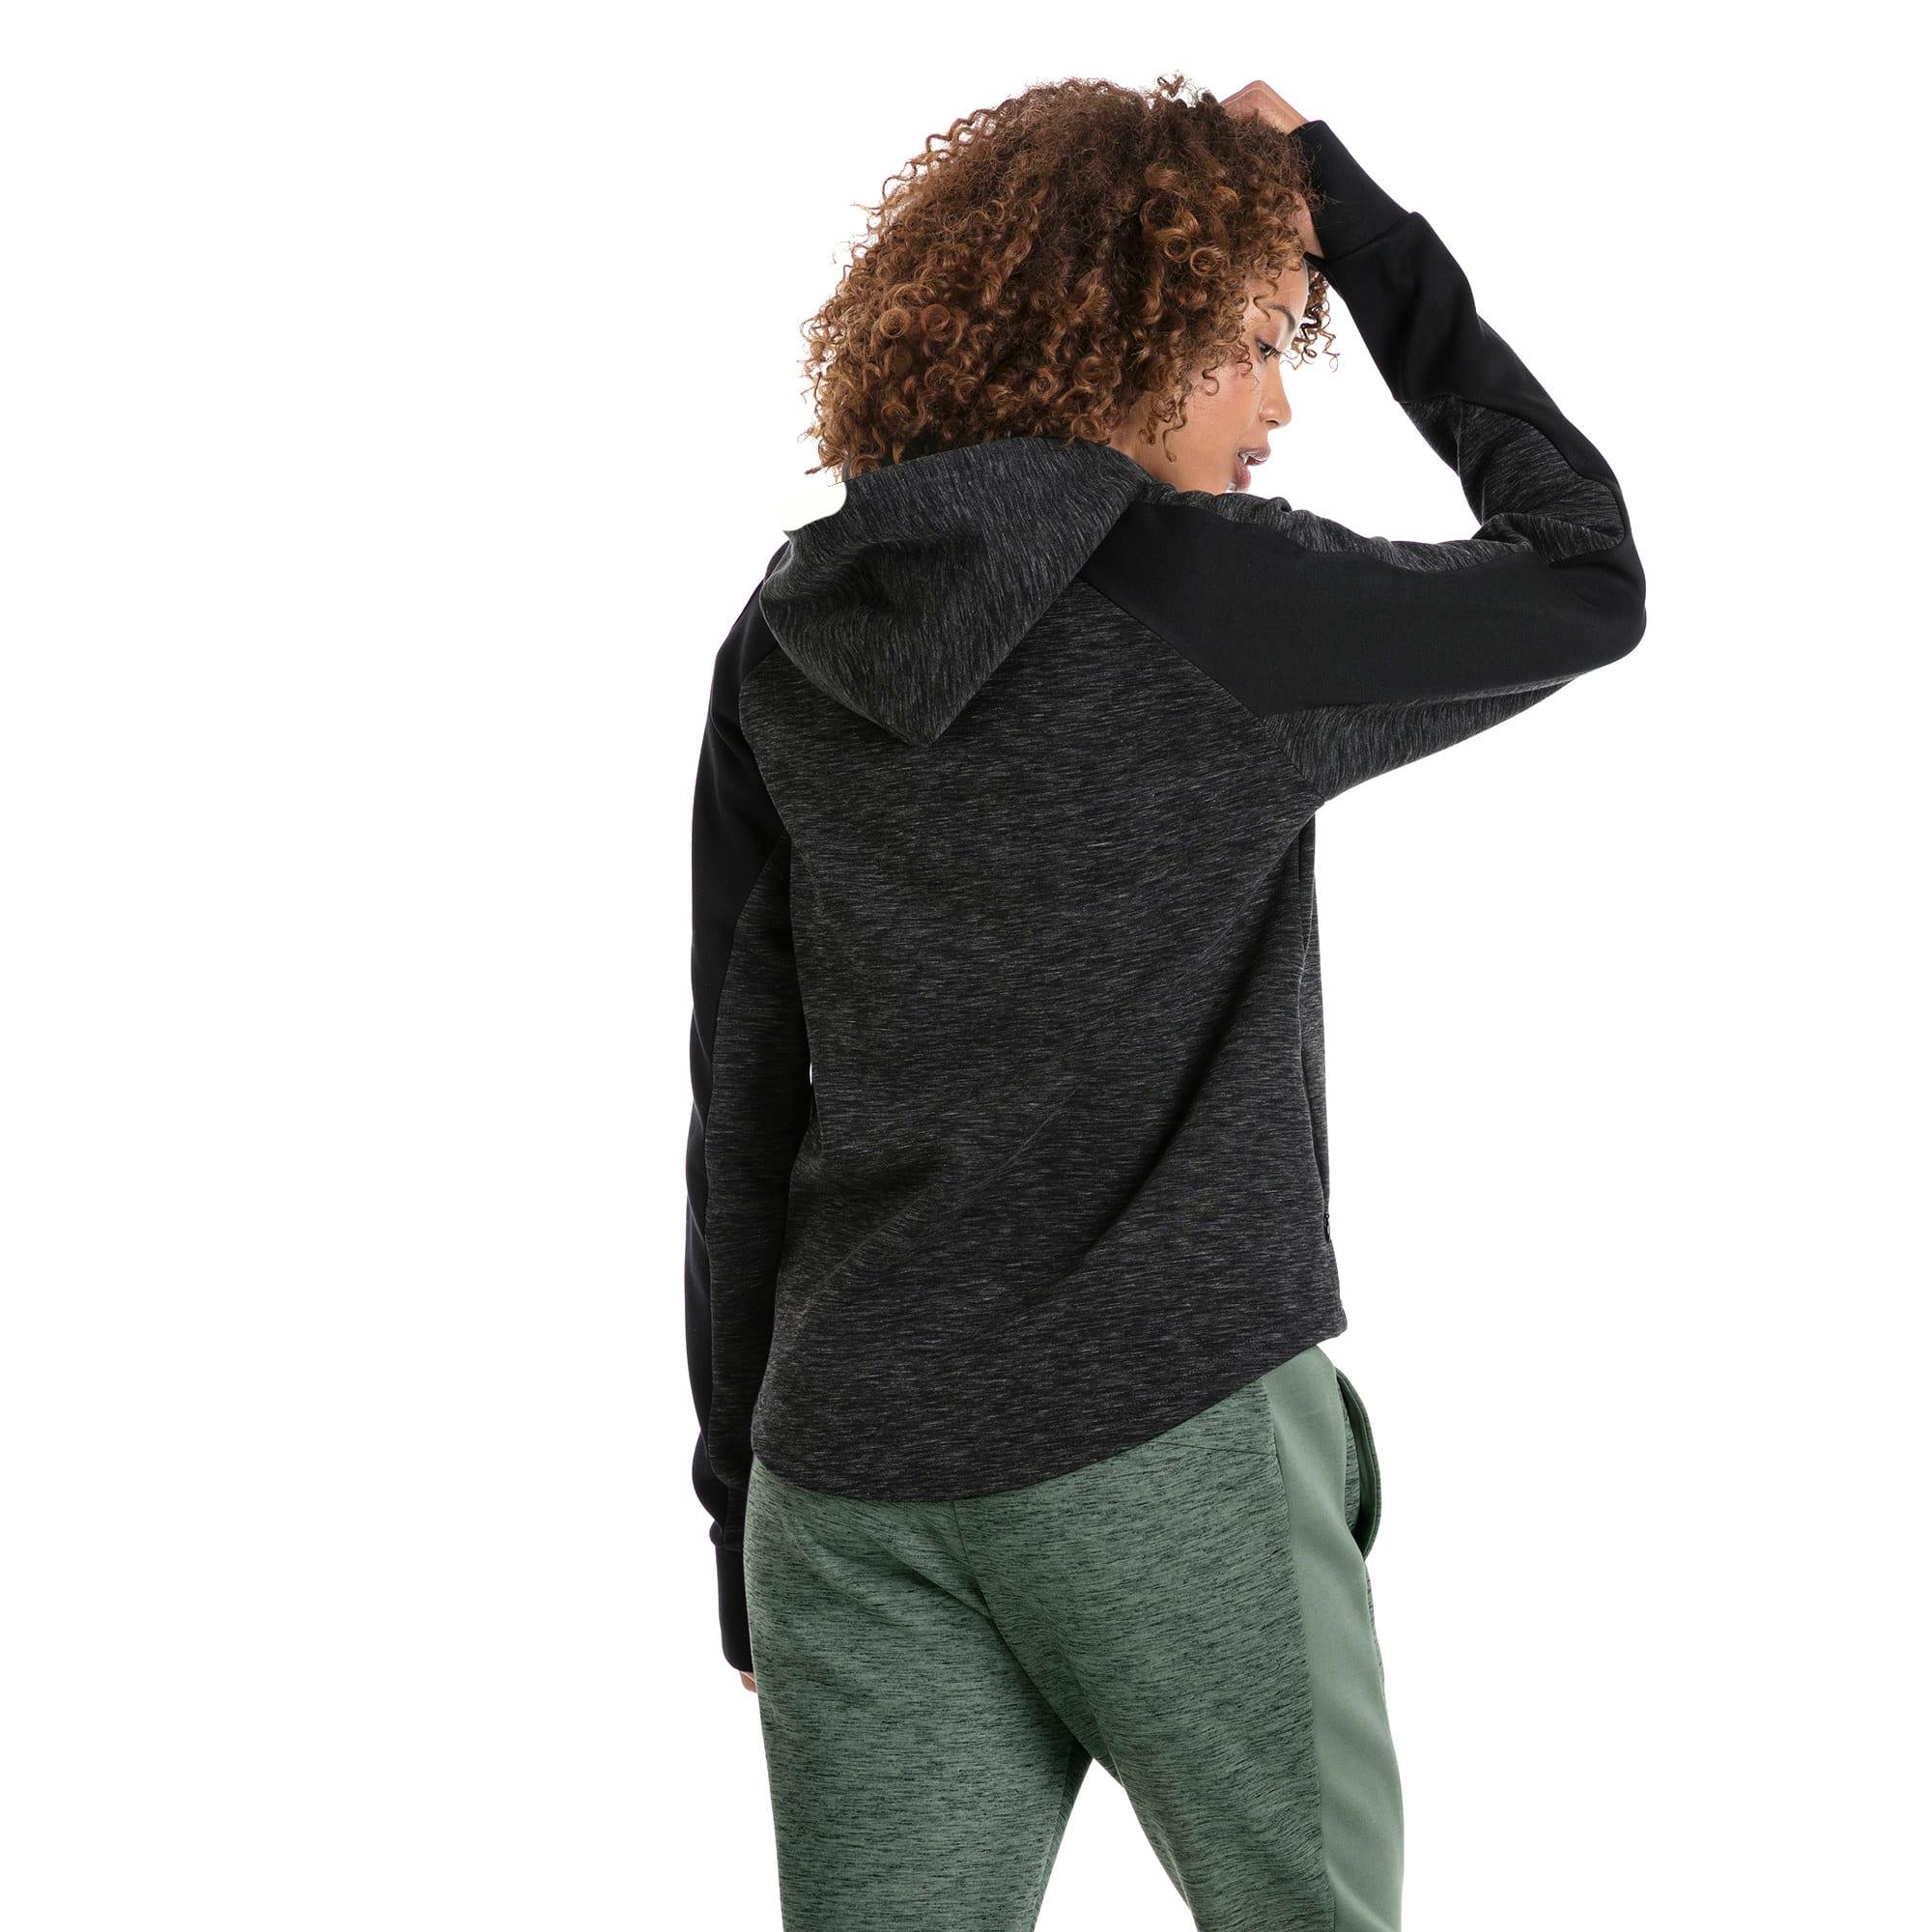 Thumbnail 3 of Evostripe Full Zip Women's Hoodie, Cotton Black-heather, medium